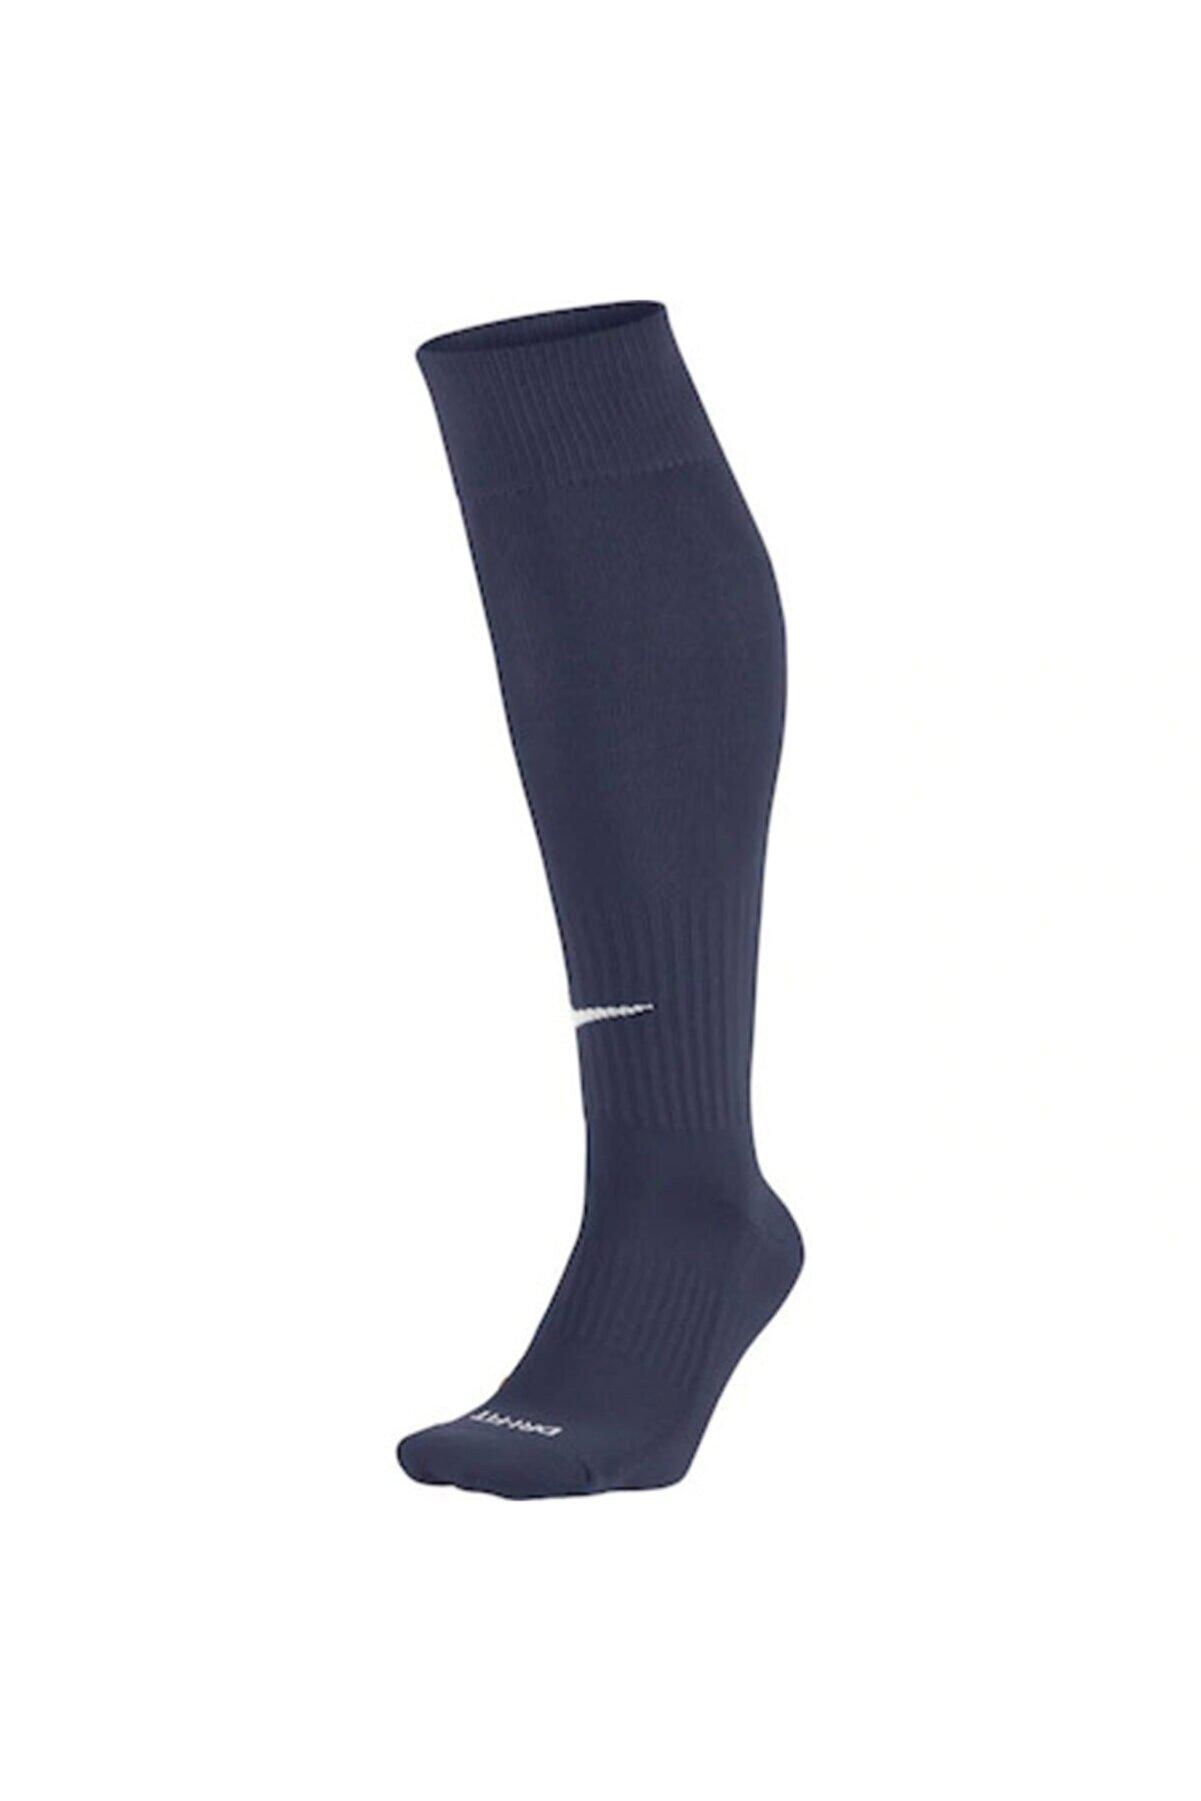 Nike Dri-fit Futbol Çorabı 42-46 Numara